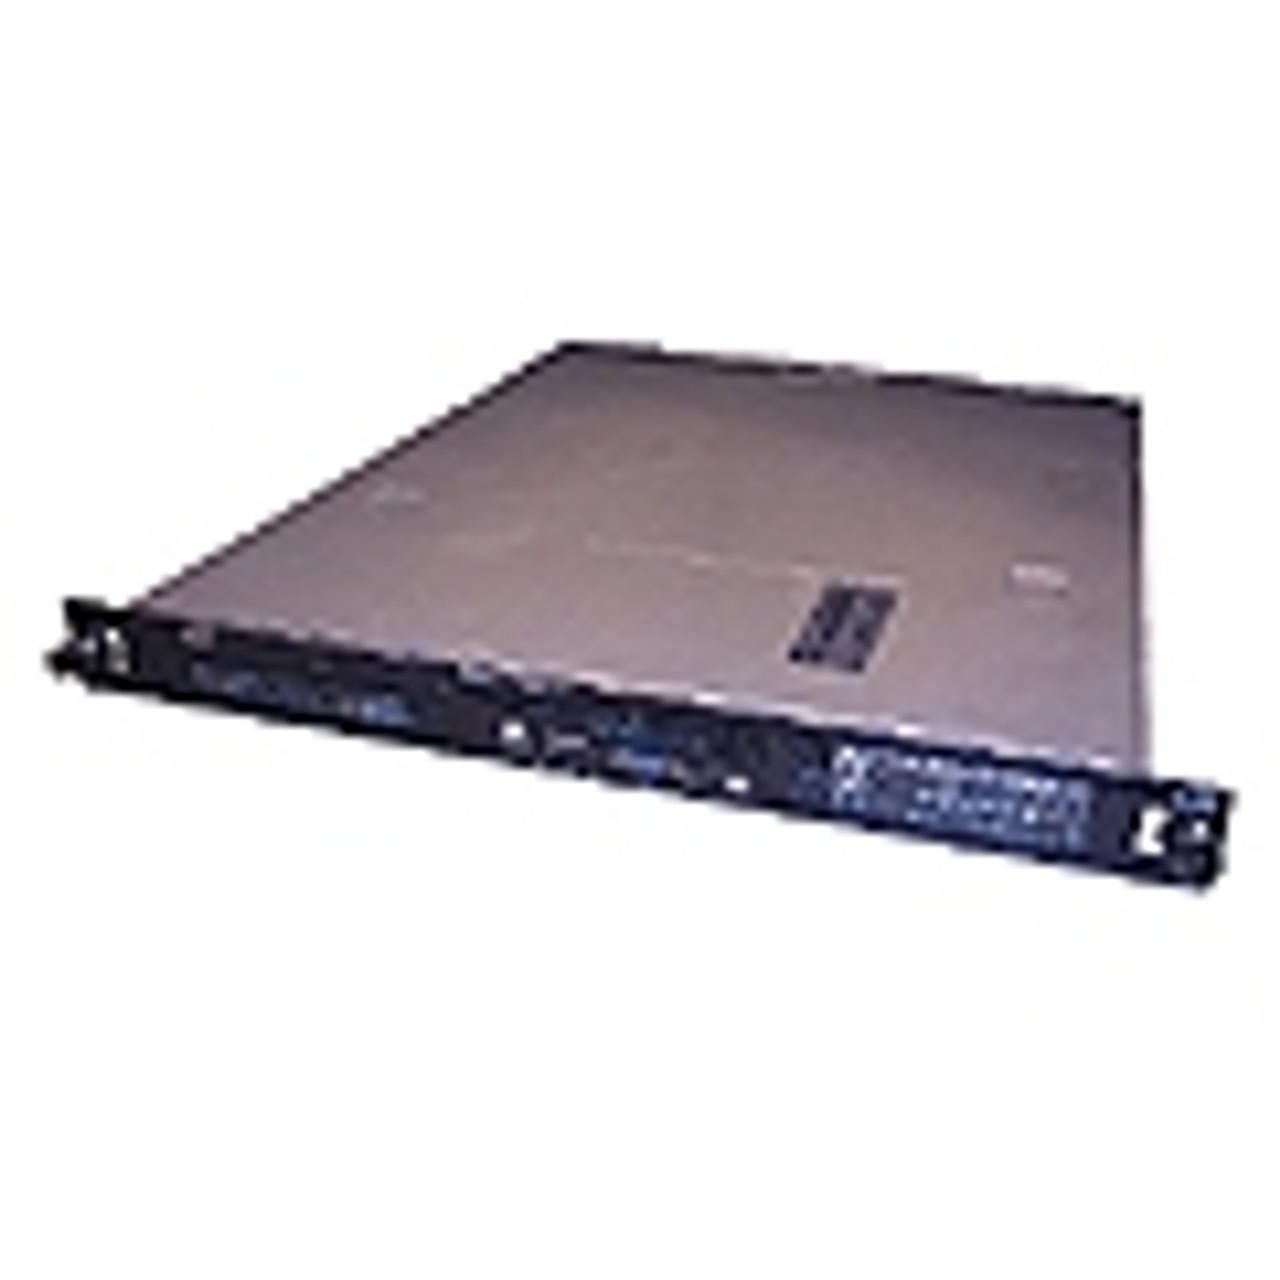 Dell PowerEdge R200 Servers